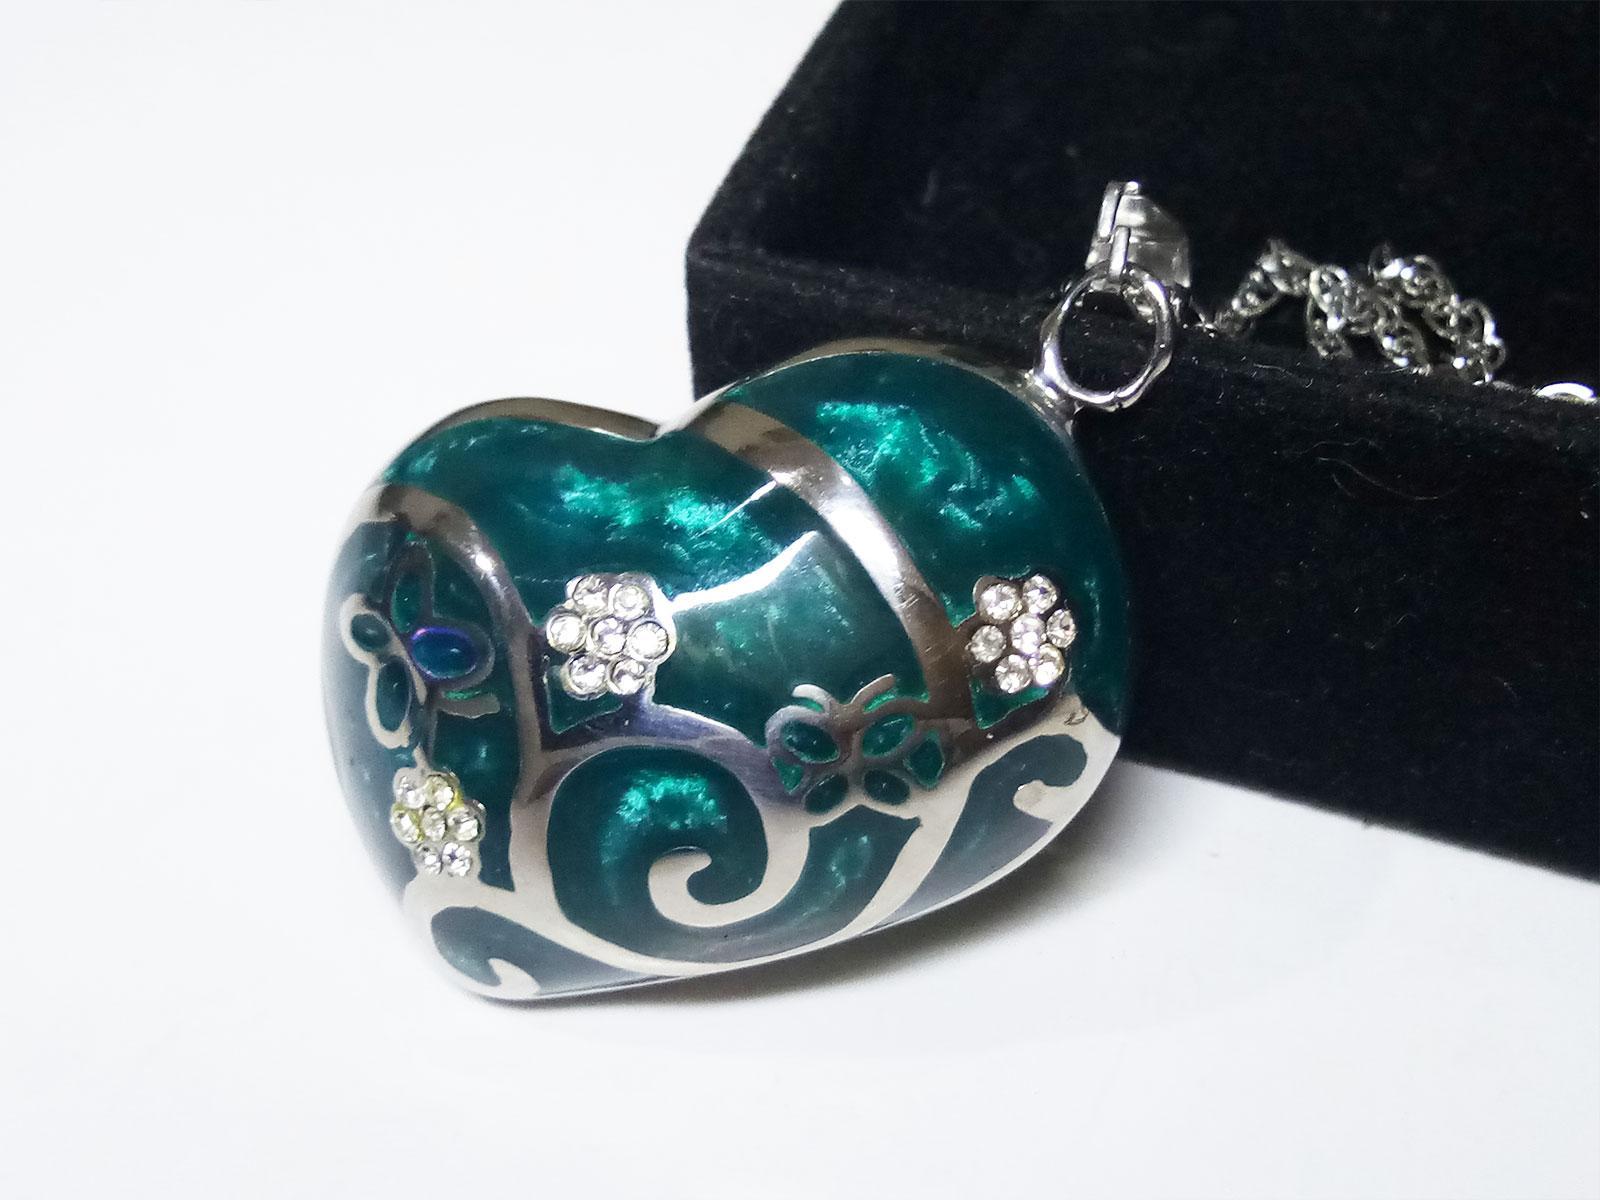 VeE Liontin Titanium Batu Bacan Cina Biru Love Kristal - Terapi Kesehatan